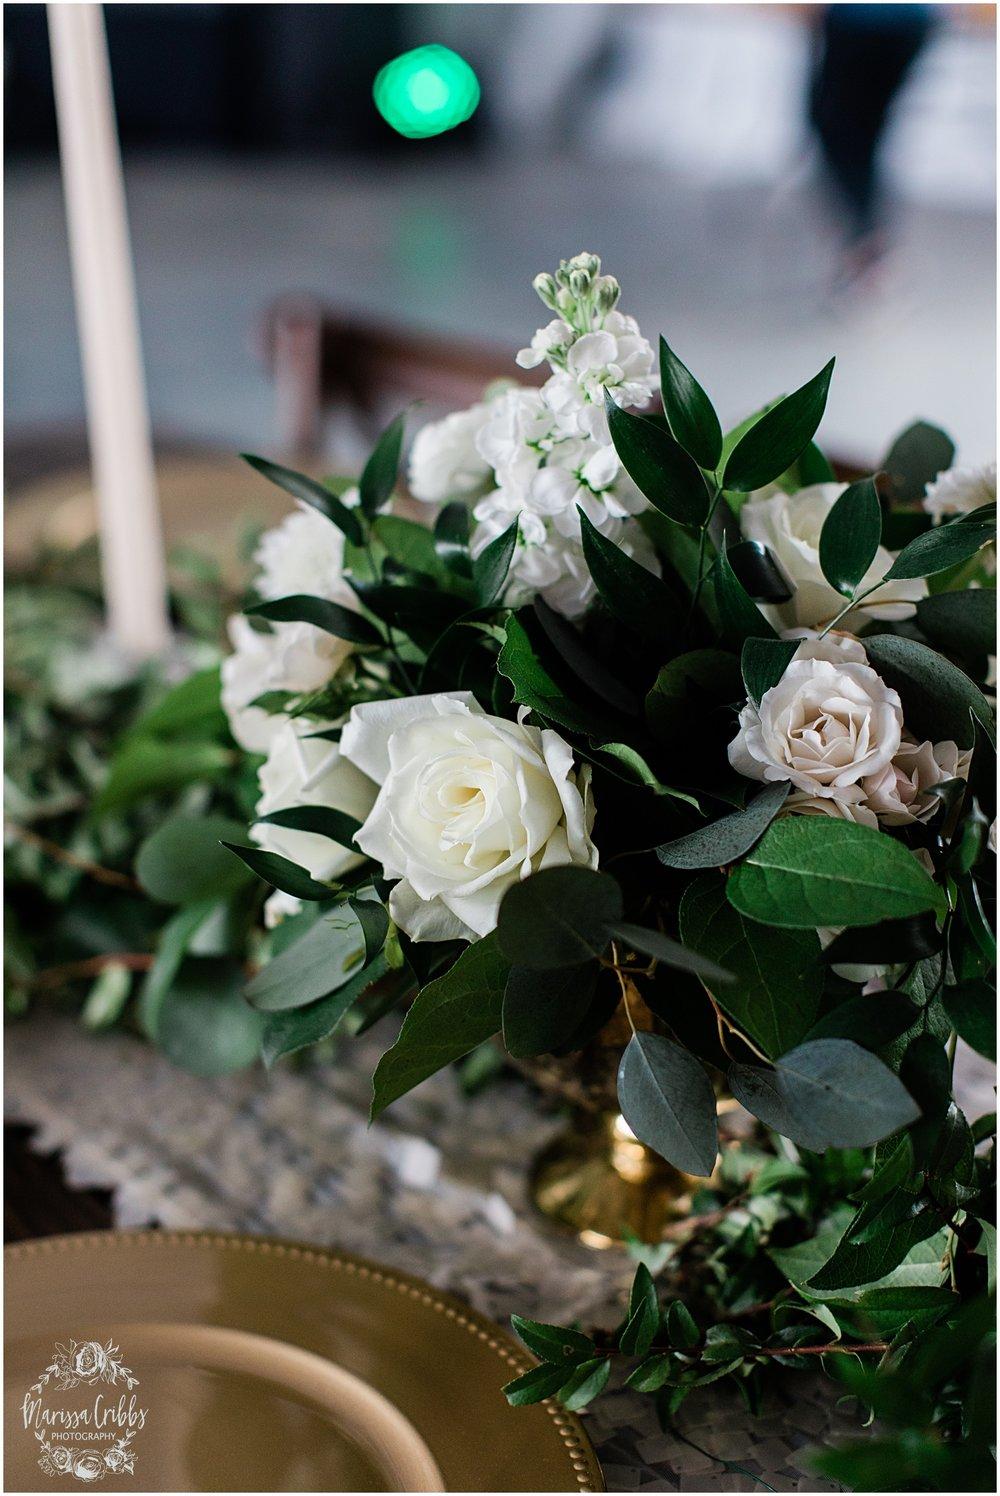 GORBY WEDDING | MARISSA CRIBBS PHOTOGRAPHY_5094.jpg